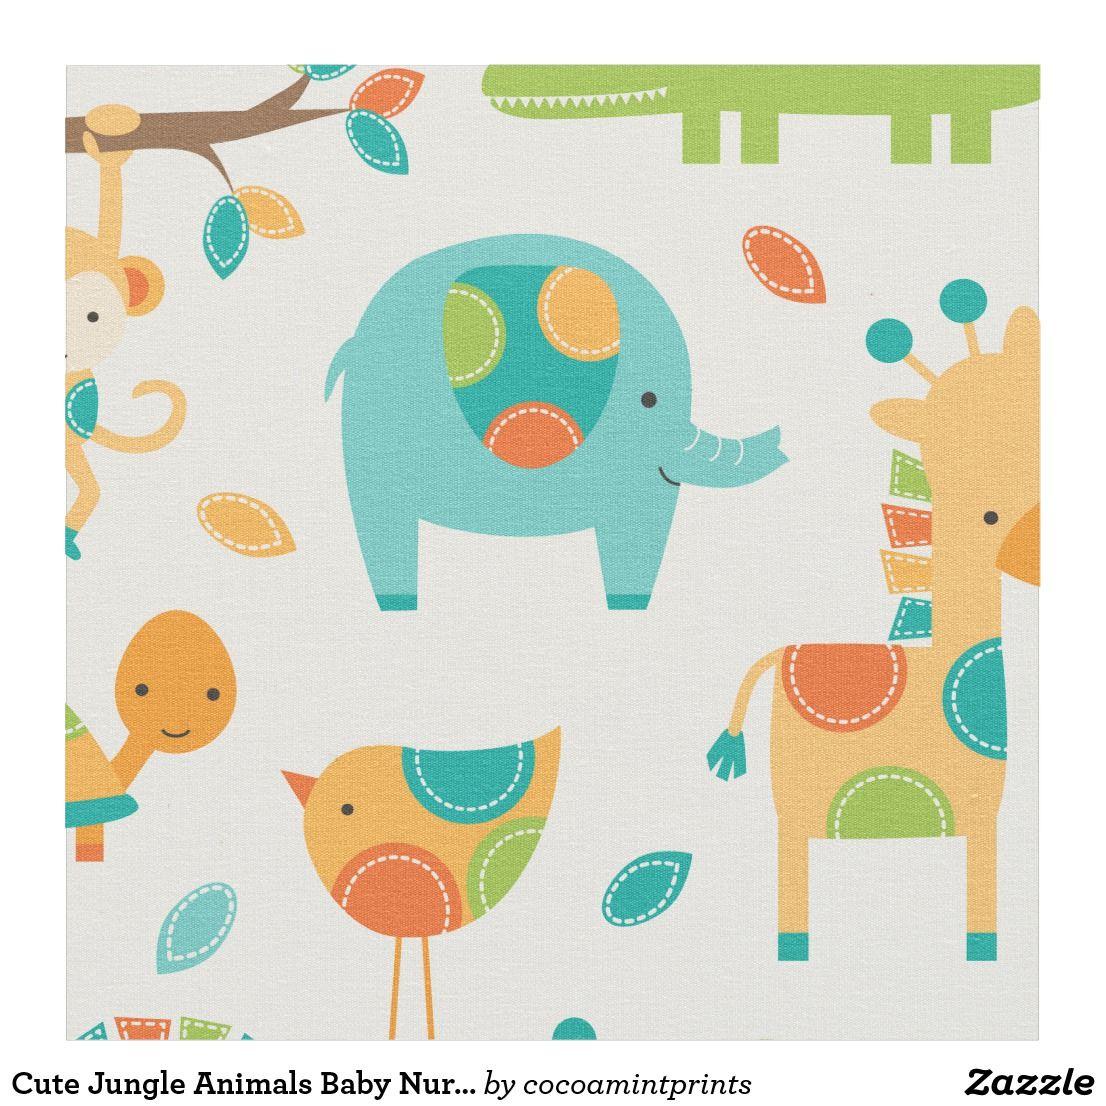 Cute Jungle Animals Baby Nursery Fabric